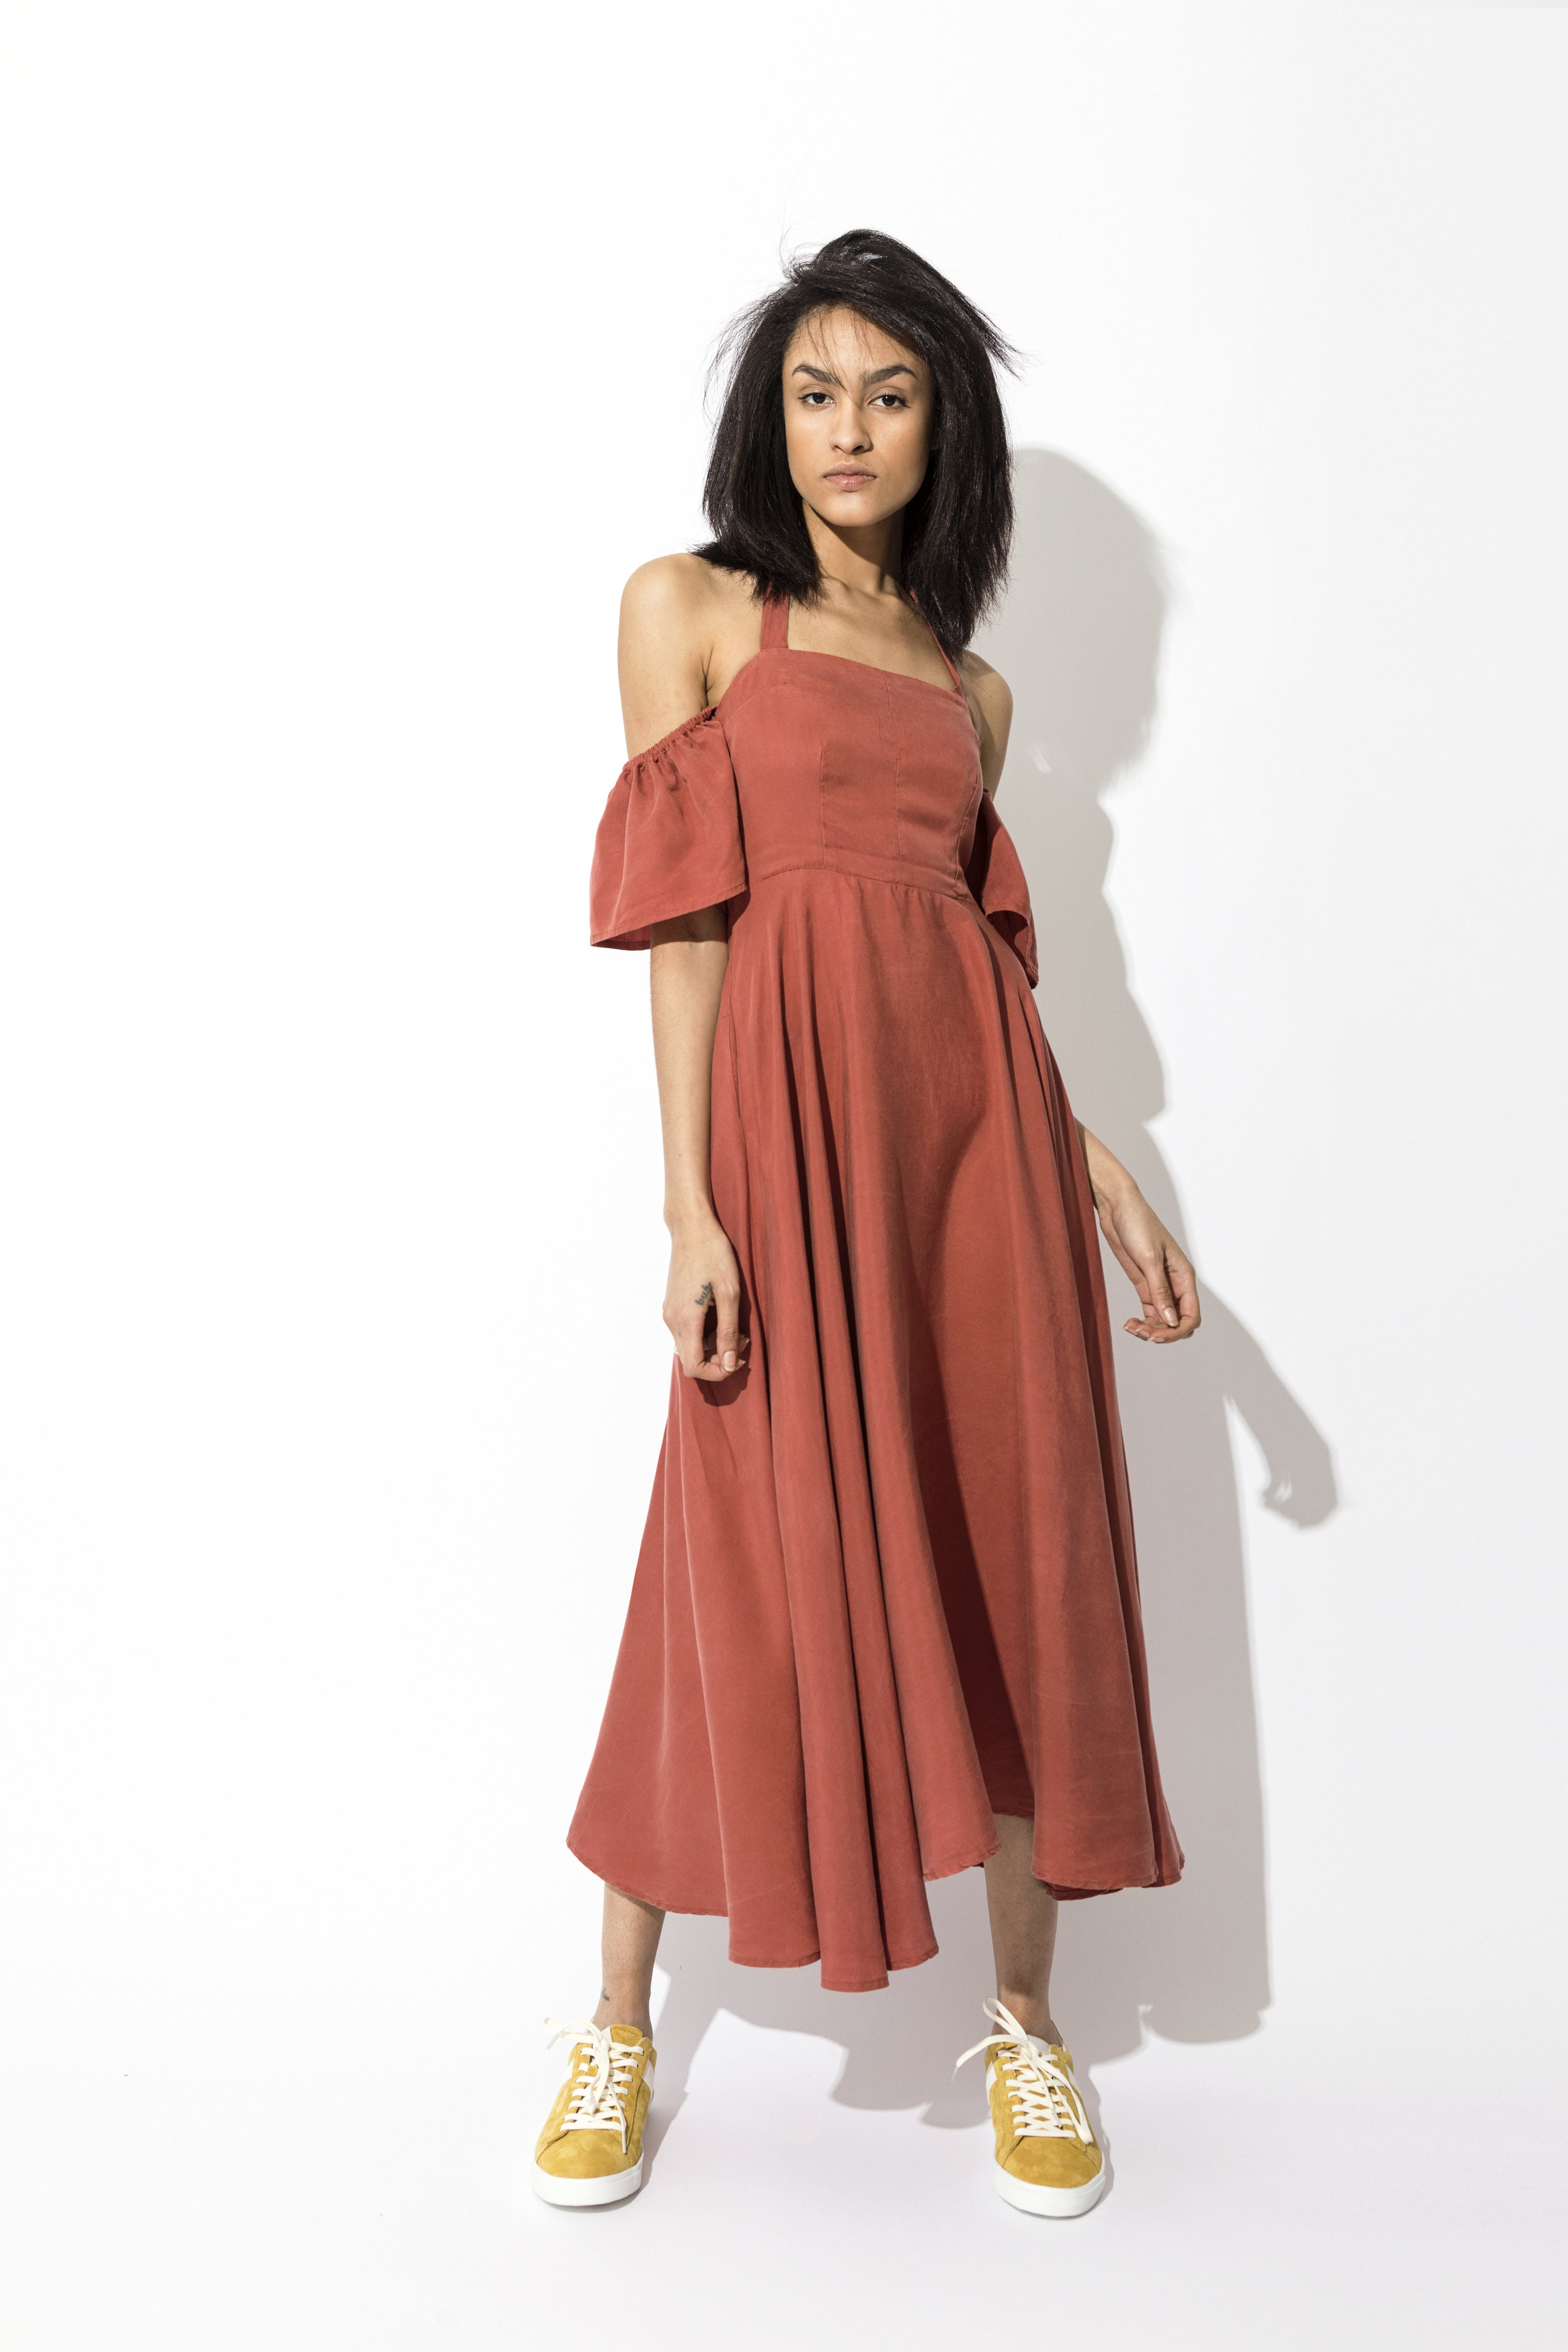 Selva-Negra-Lima-Dress-1.jpg